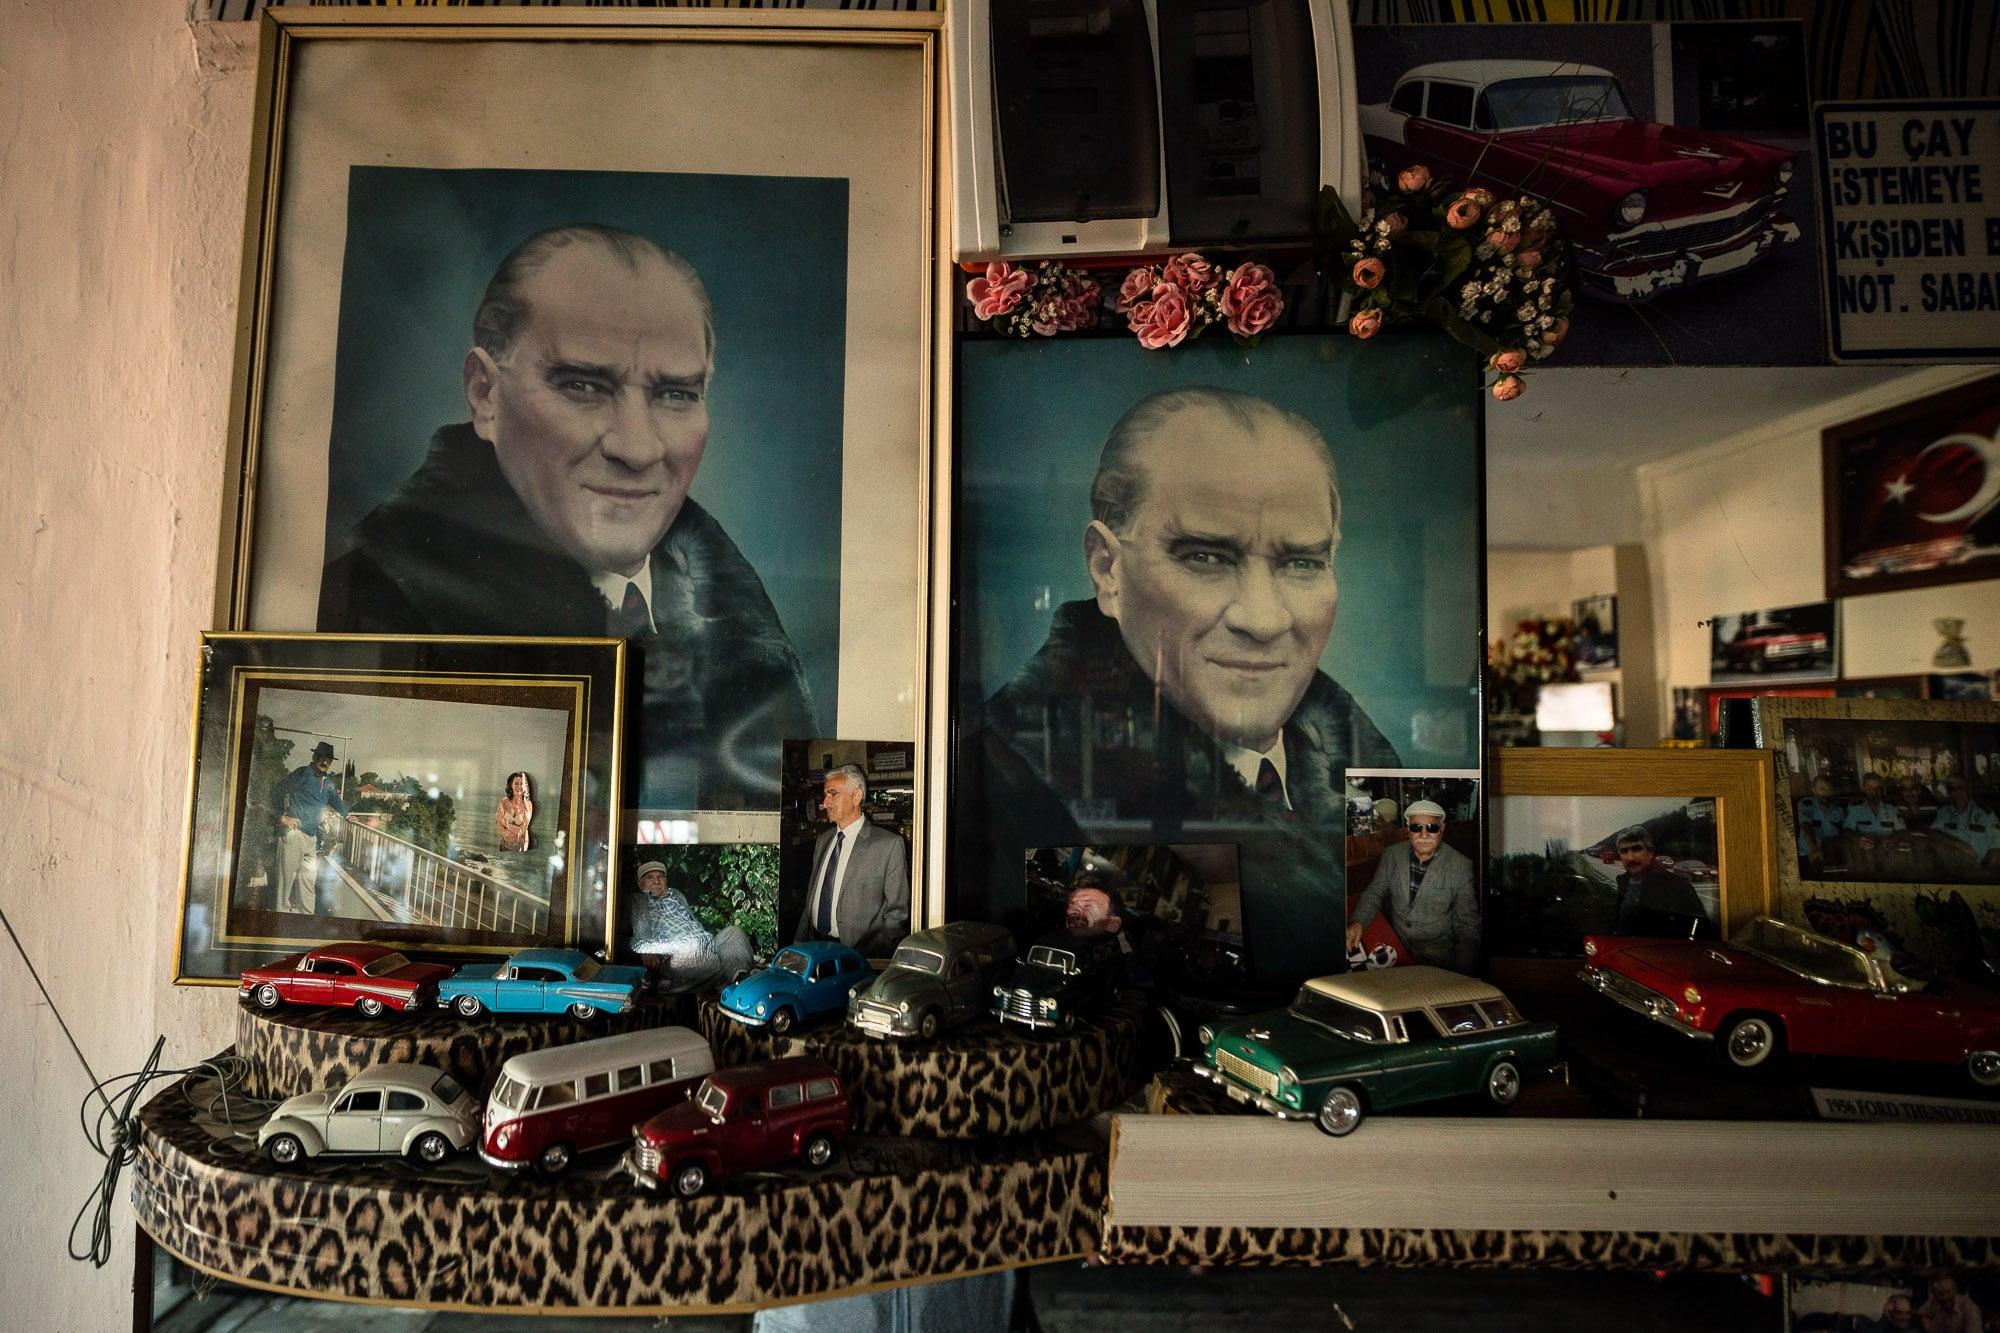 Atatürk pictures